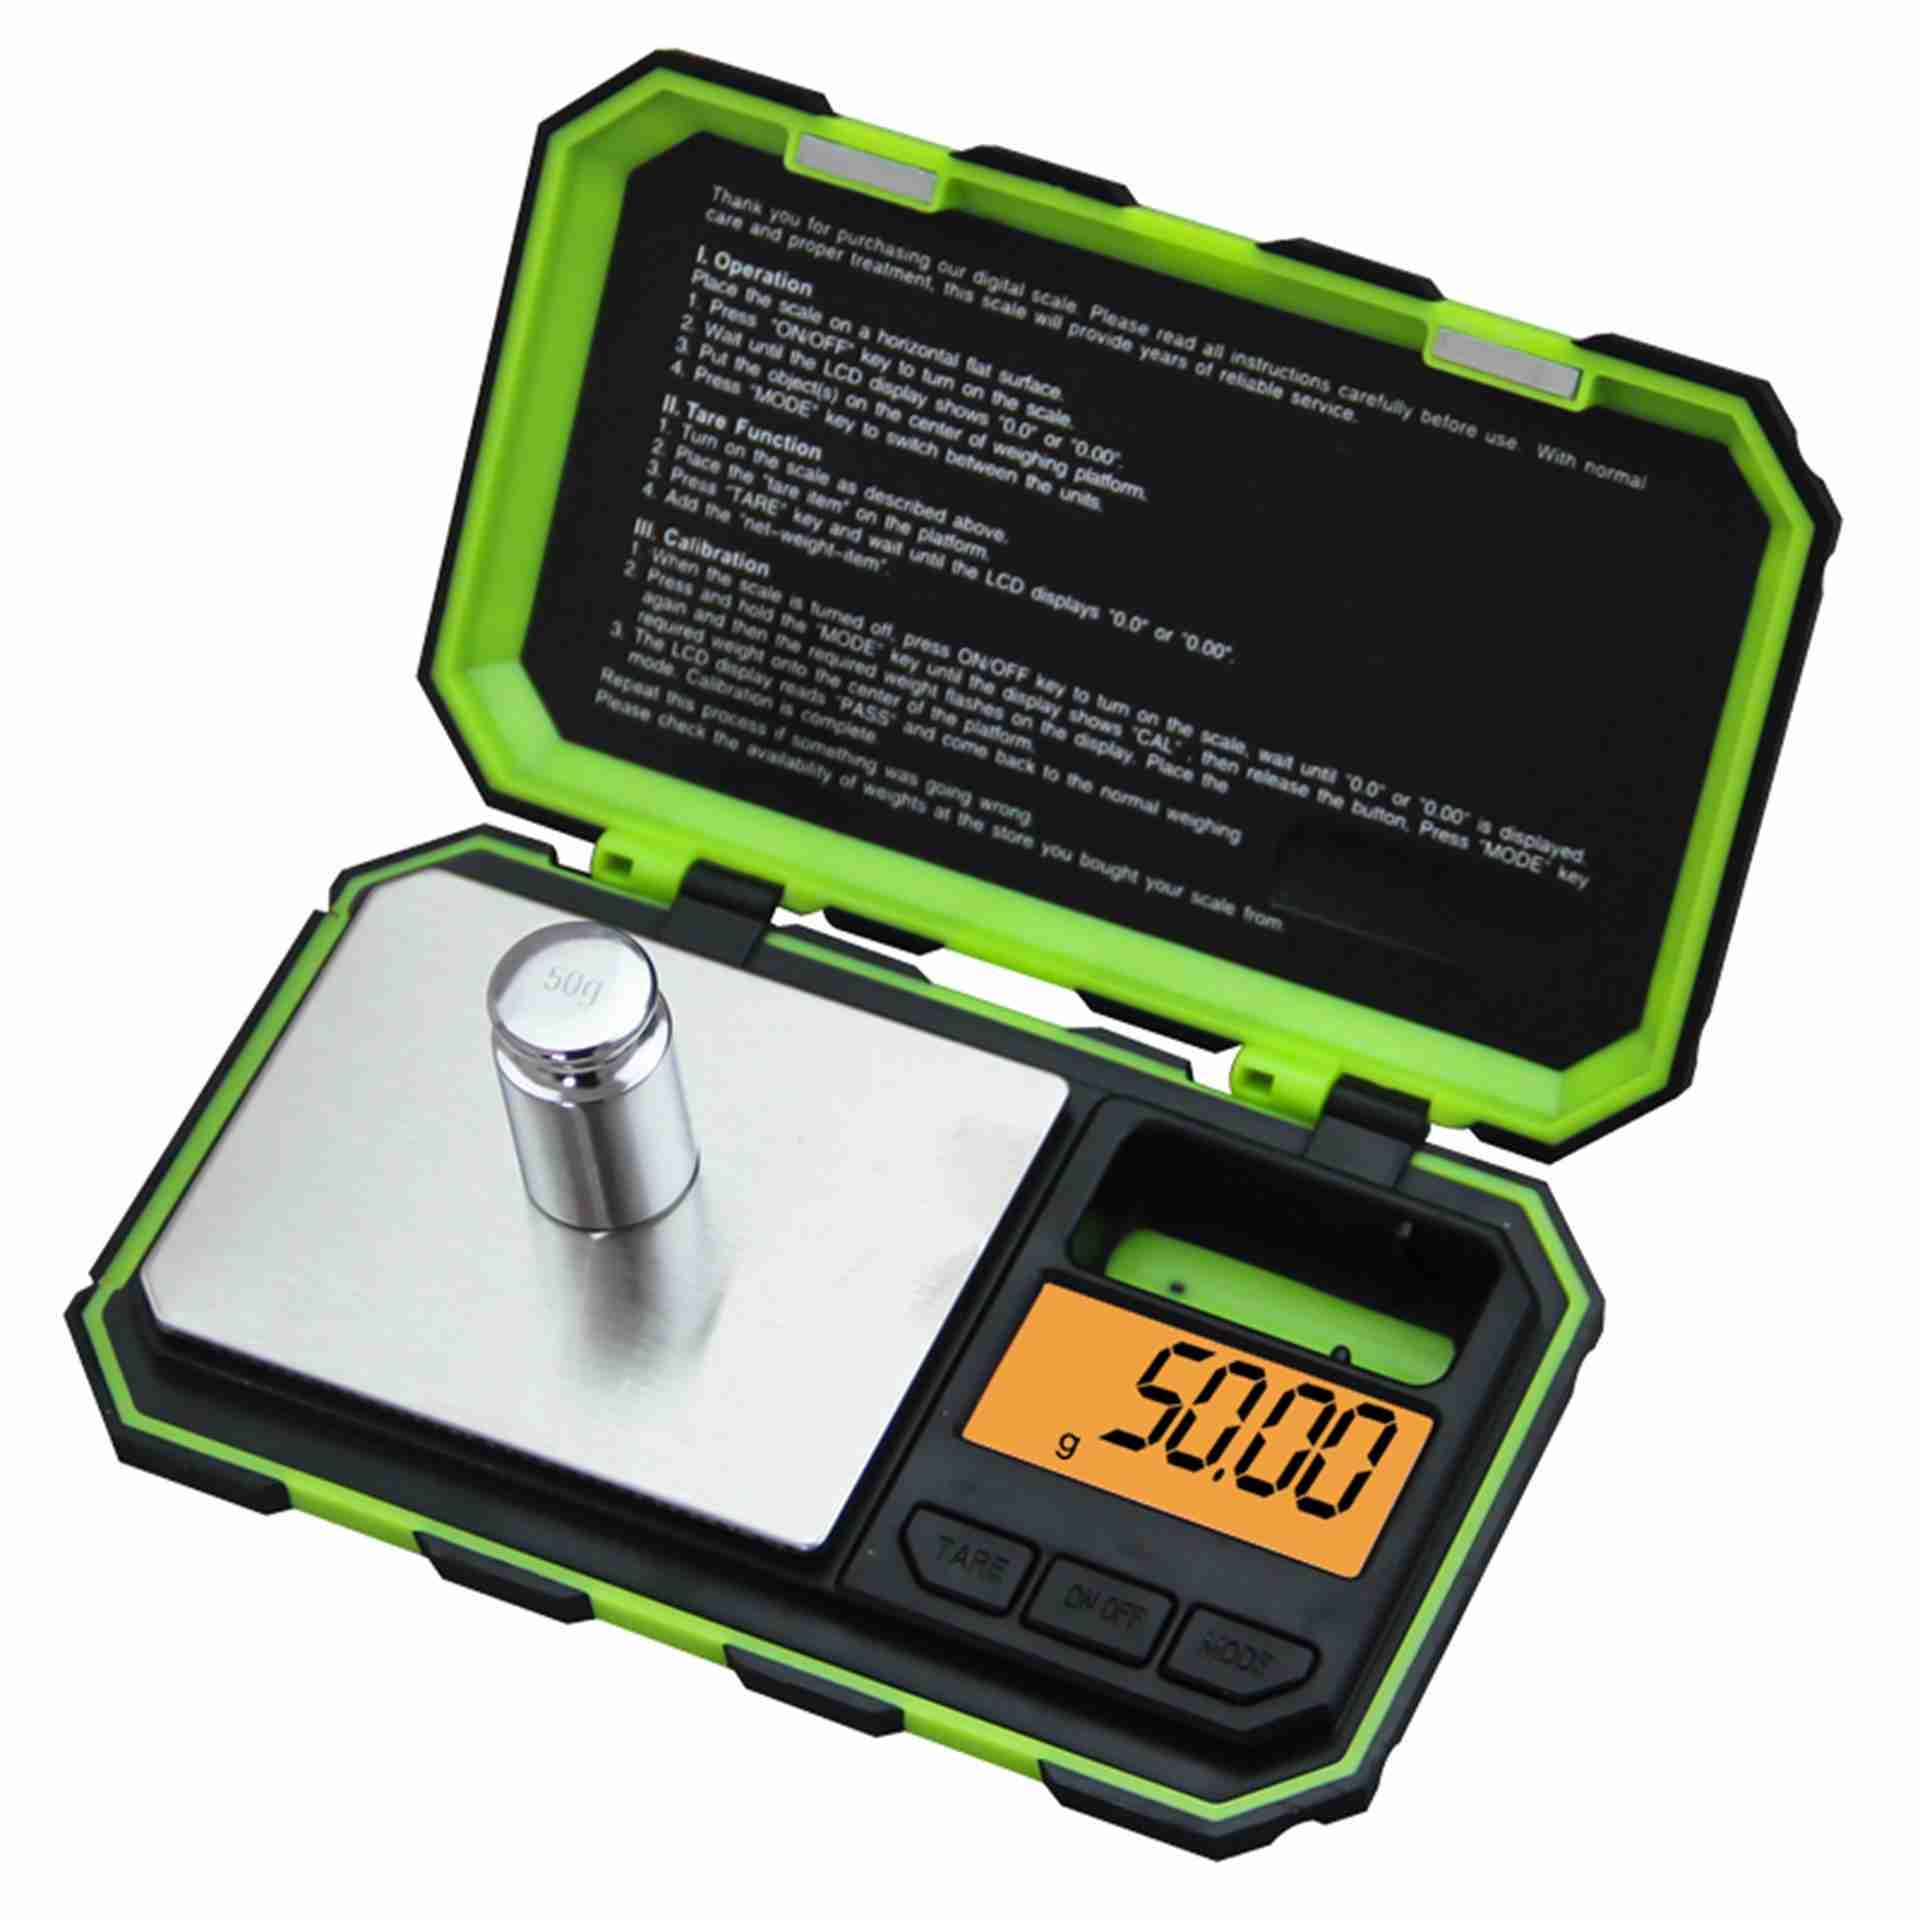 200*0,01g Mini alta precisión Digital portátil joyería oro escala profesional Banlance peso herramientas electrónica cocina máquina